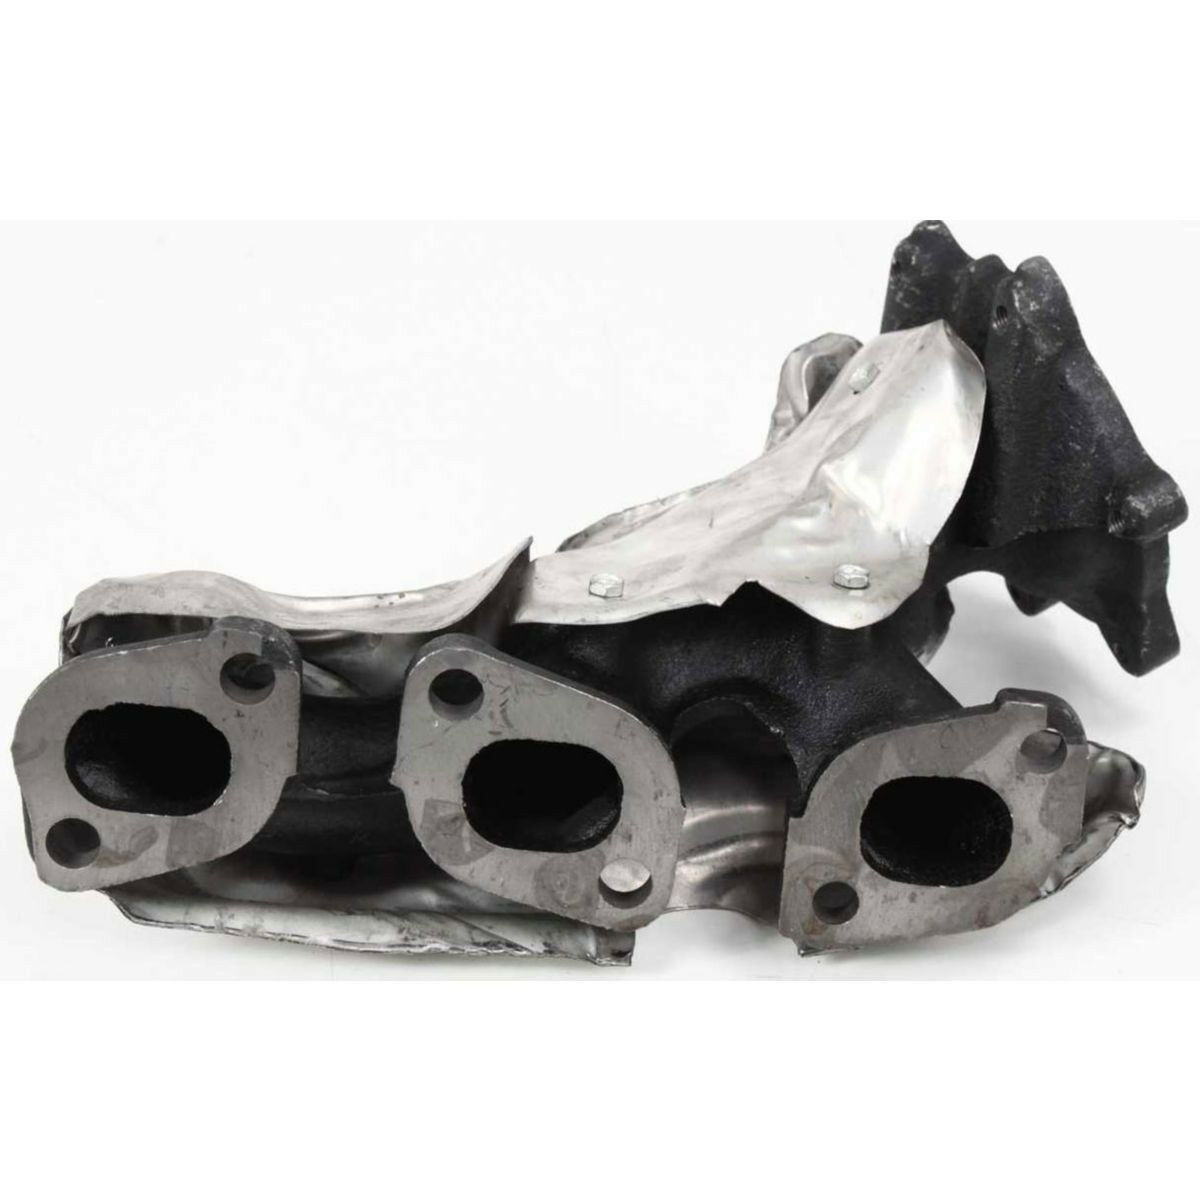 NEW For Porsche 911 Pair Set of 2 Exhaust Mufflers Strap OE Supplier 90111115704